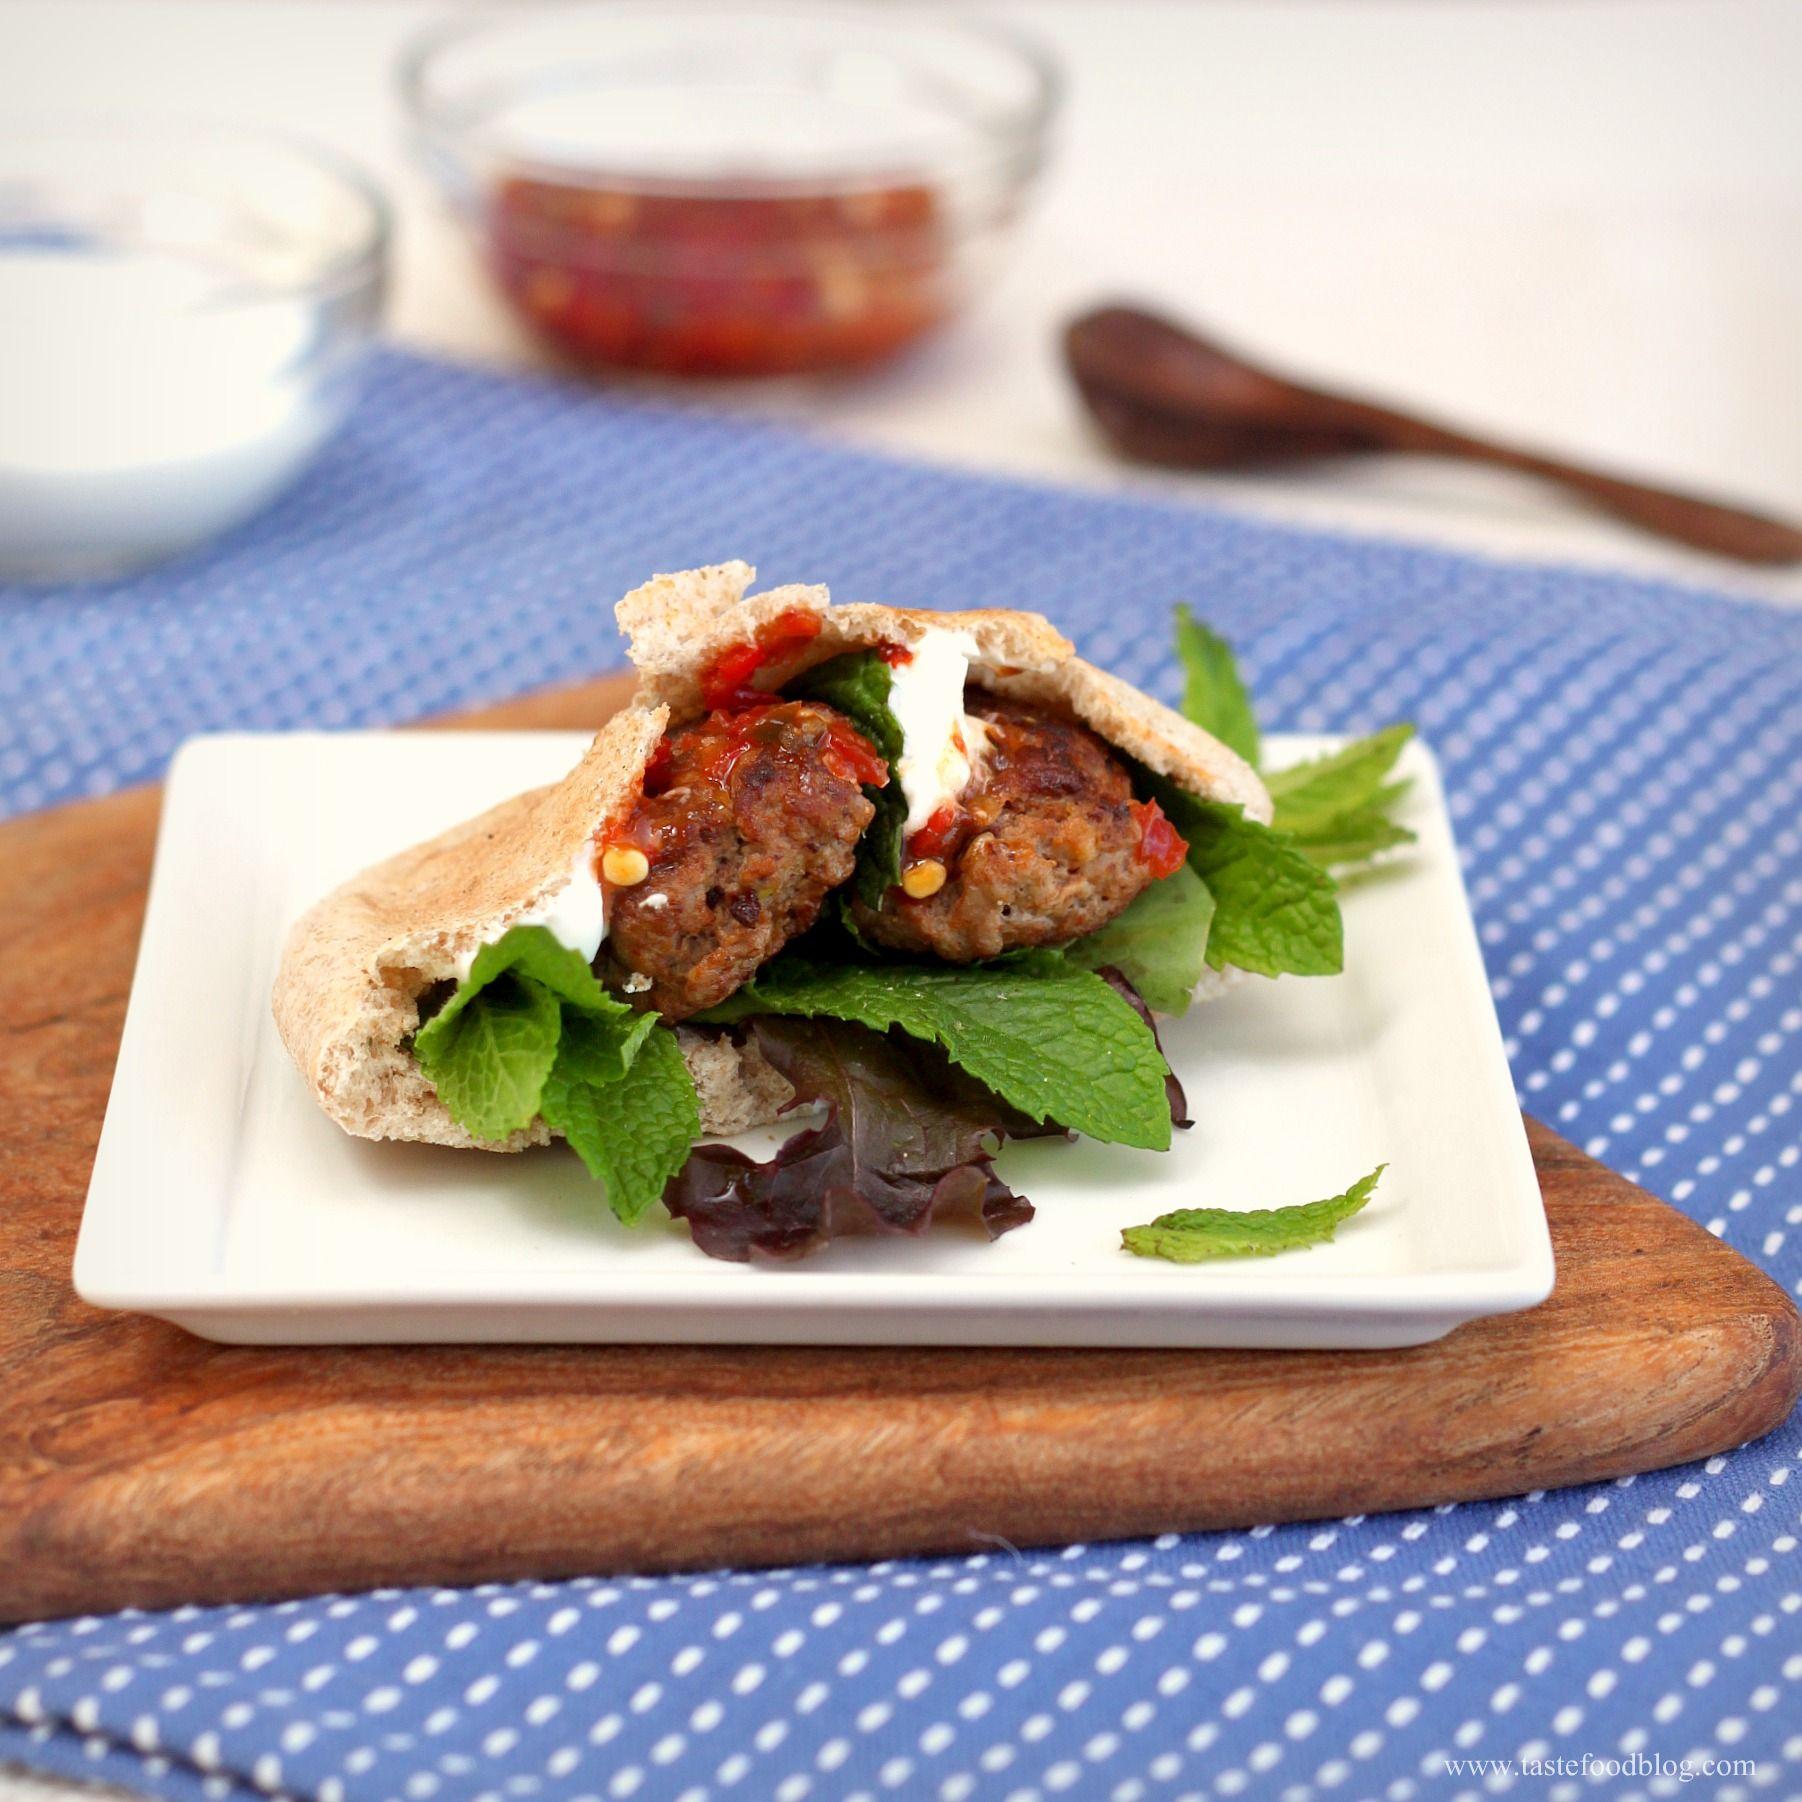 Merguez in pita - Sausage recipes, Recipes, Weeknight meals